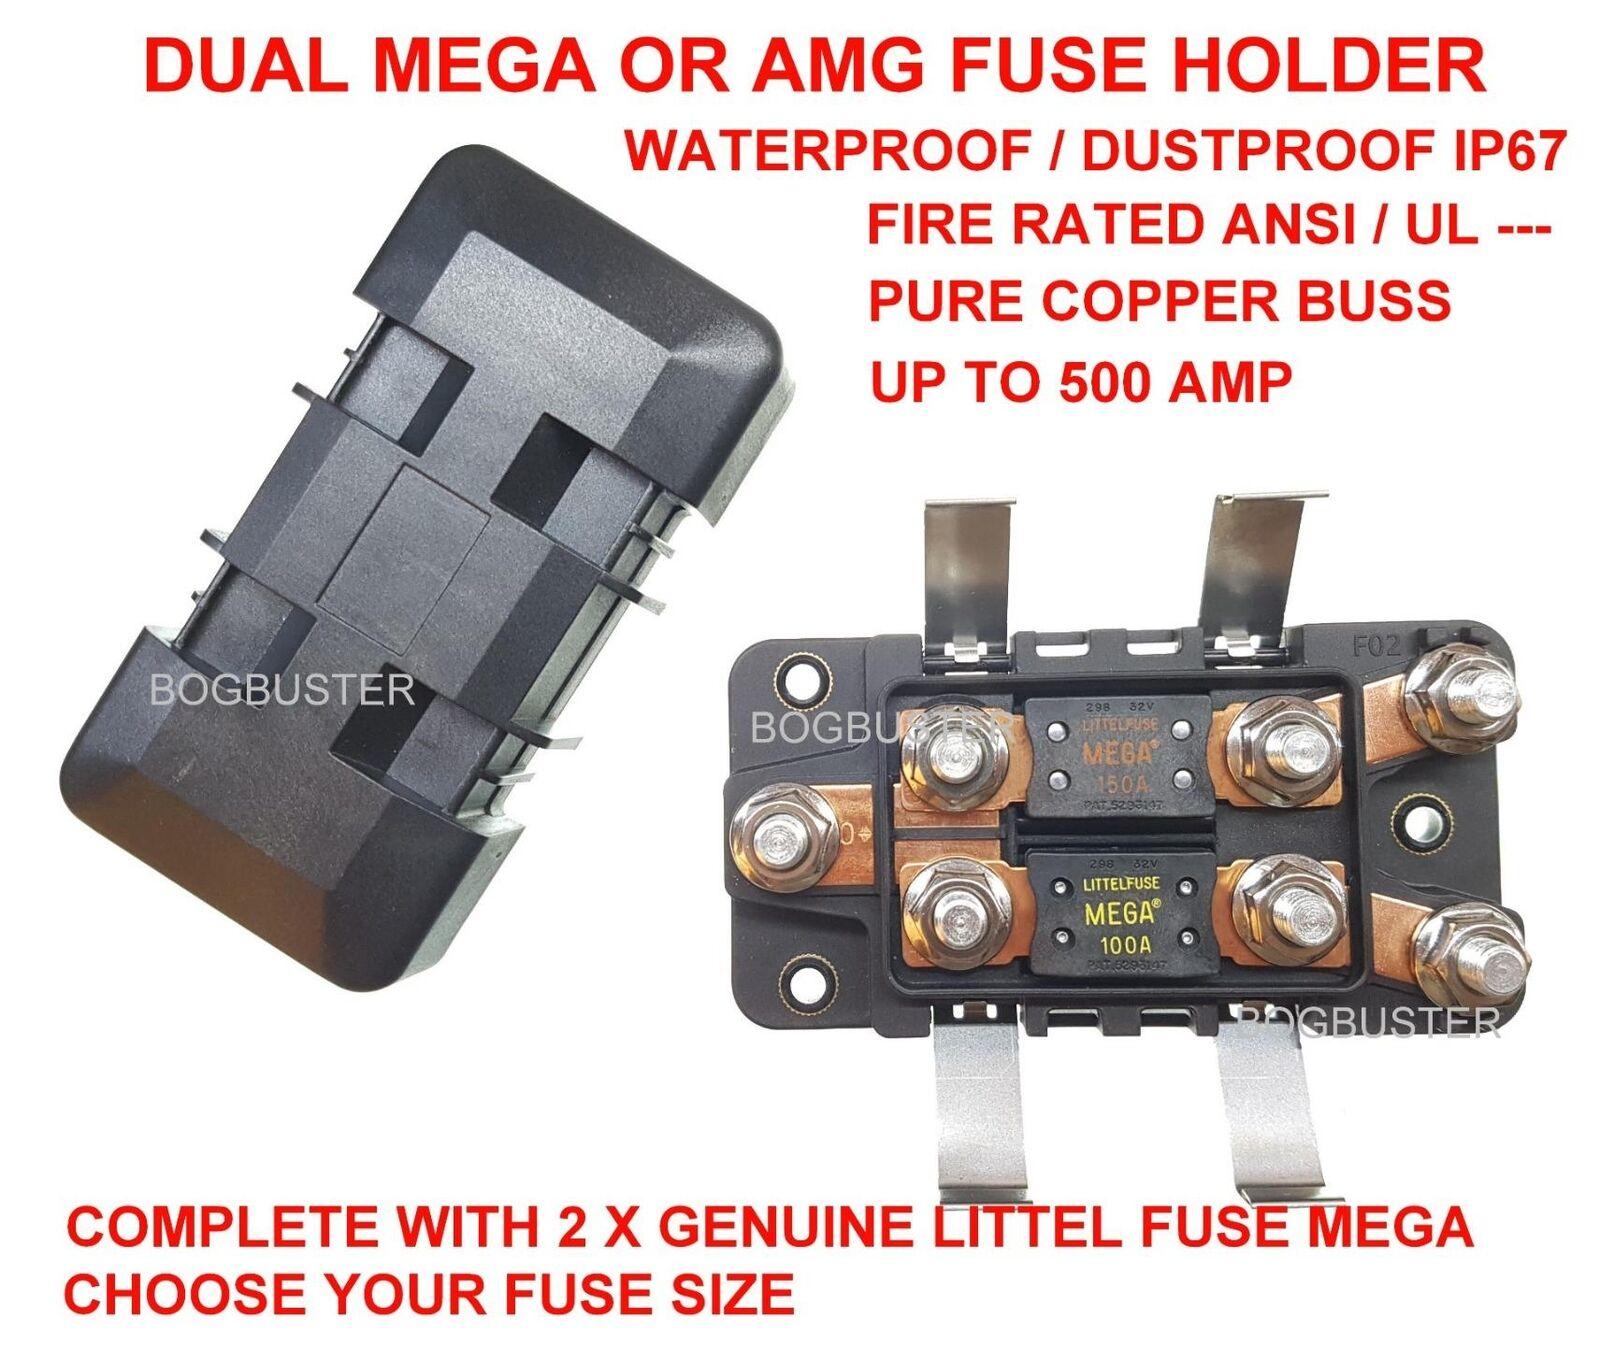 Bussmann Fuse Block Mega Littelfuse Box Holder Amg Dual Amp Waterproof Battery Kit System Solar 1600x1347